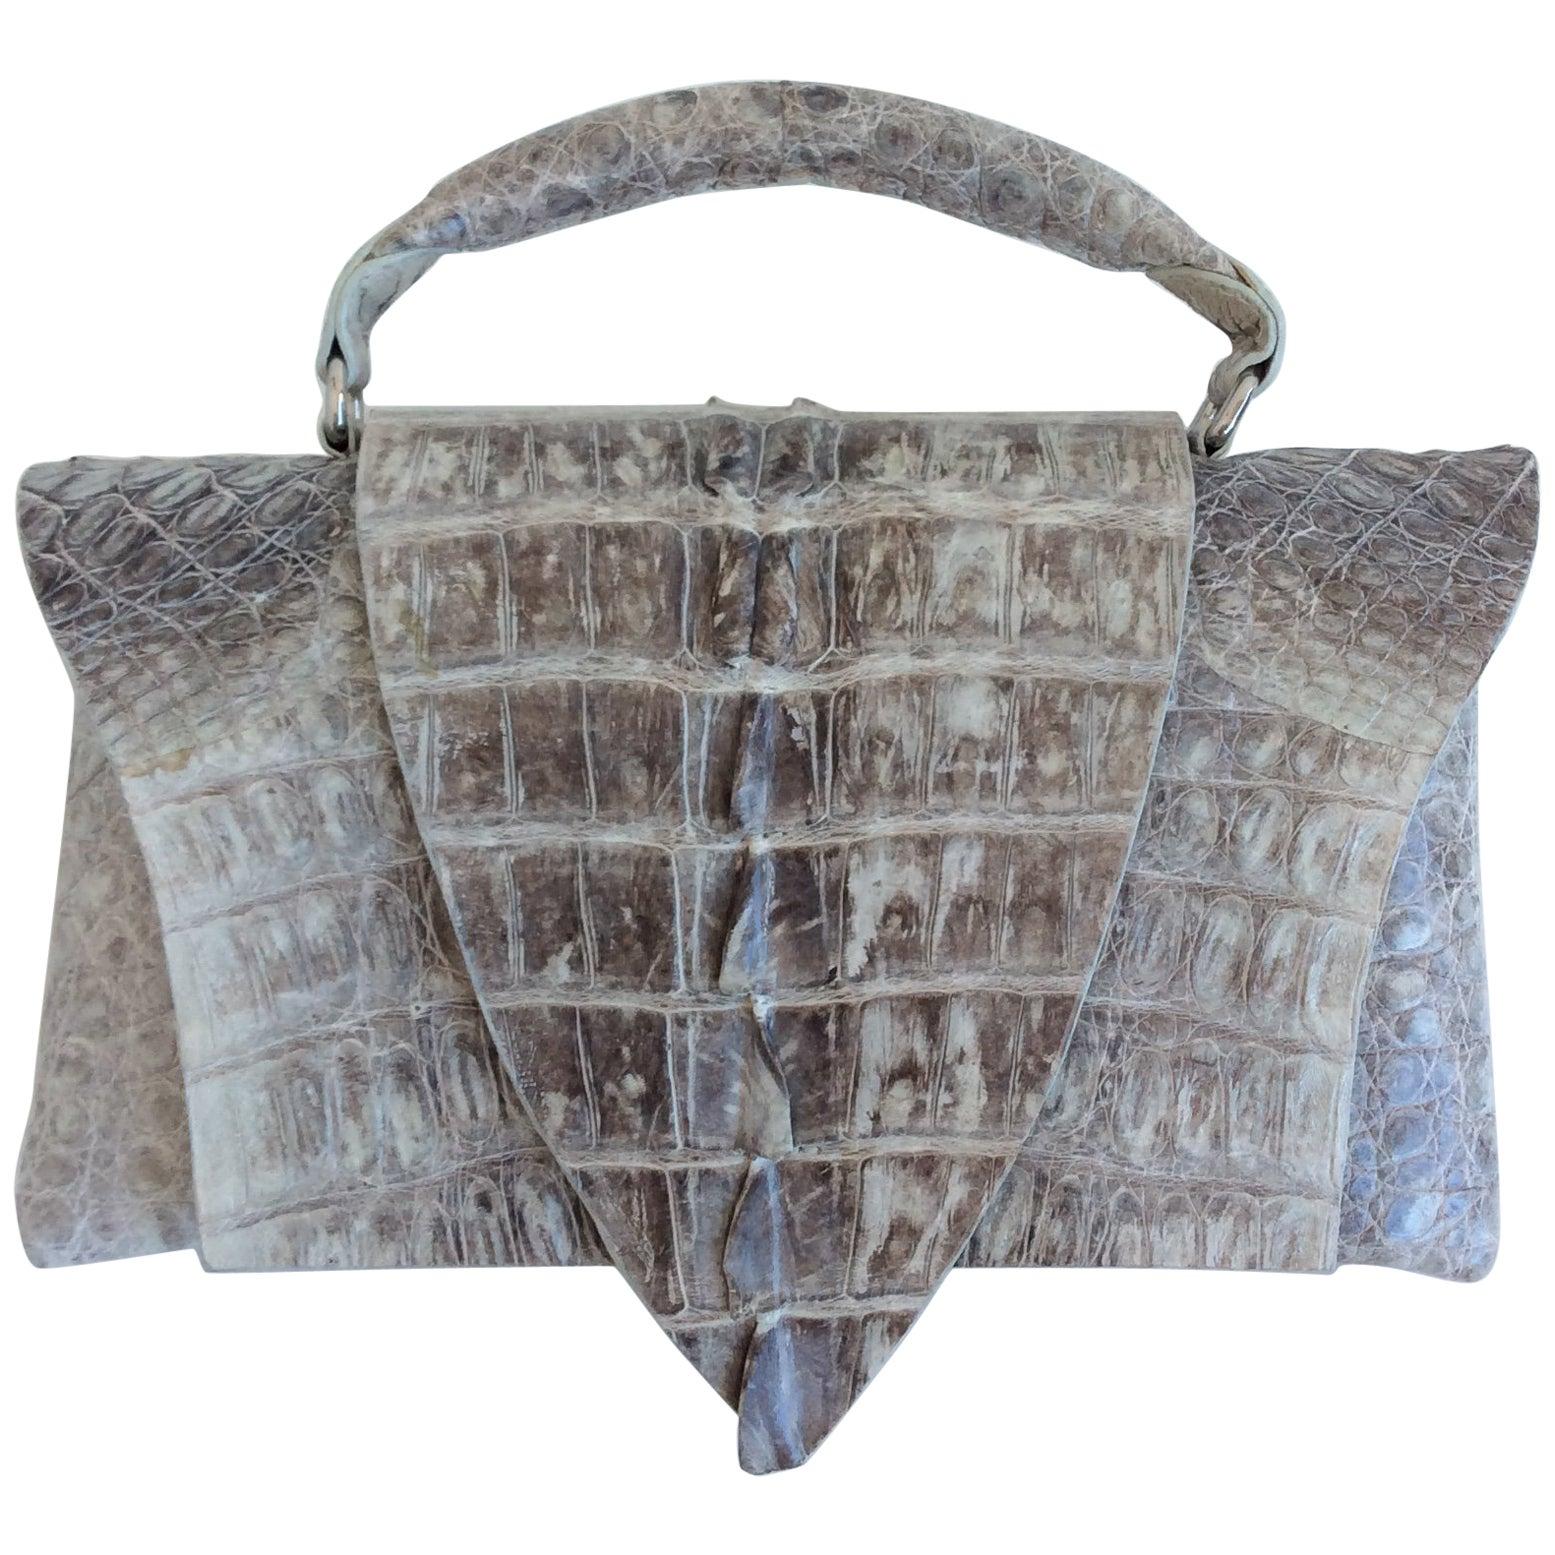 1stdibs B. Romanek Gray Crocodile Rockstar Clutch Bag With Handle ISlZzyJ1kv